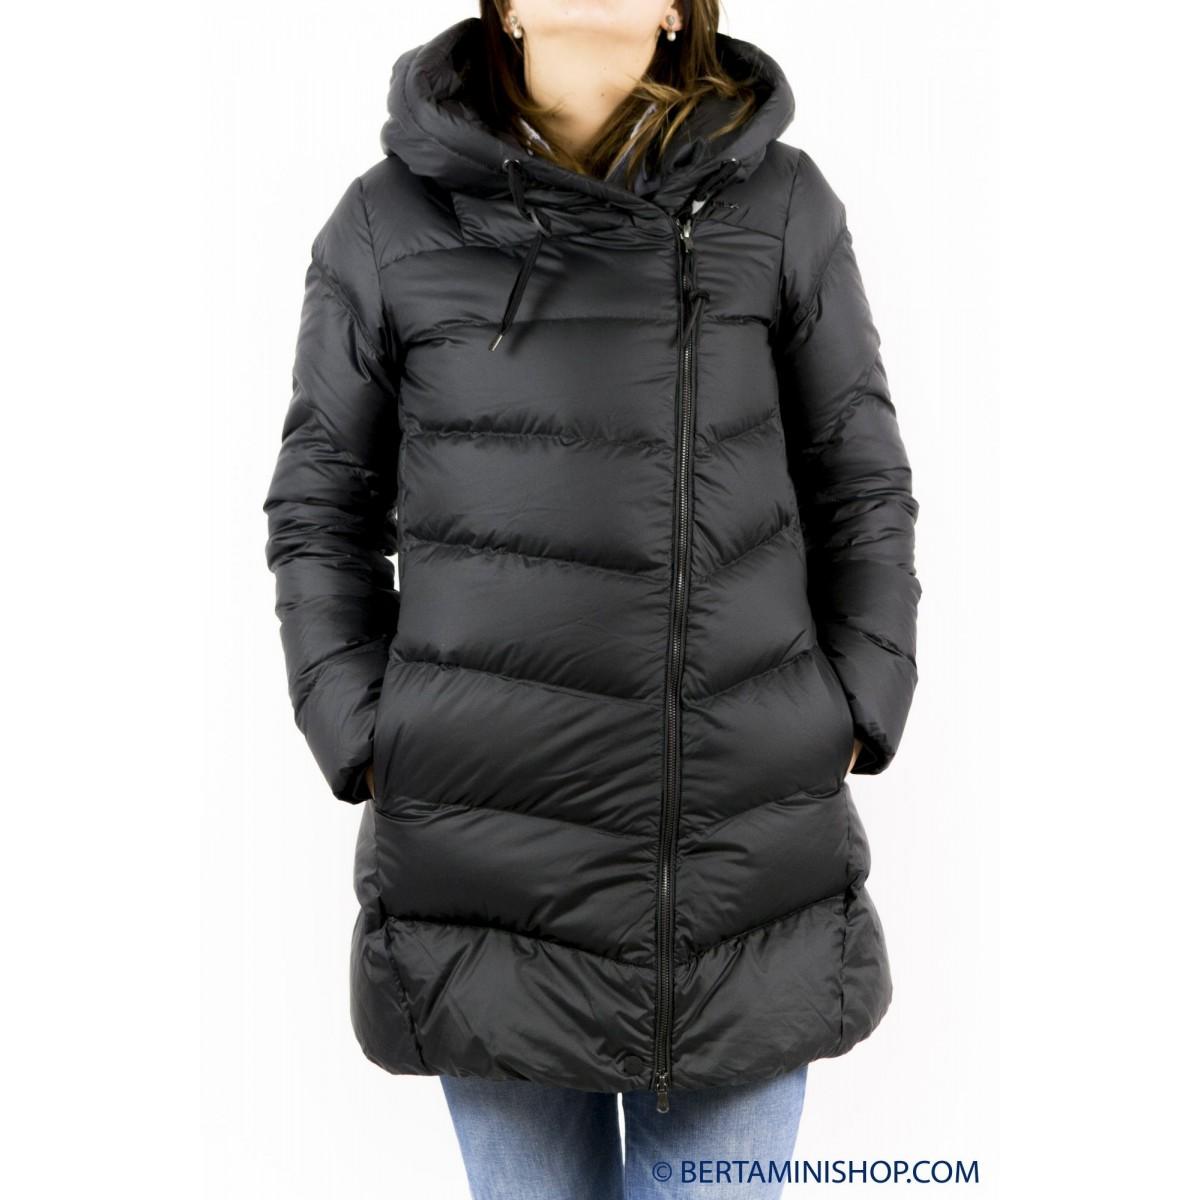 Down Jacket Ralph Lauren Woman - V30Id203Bd200